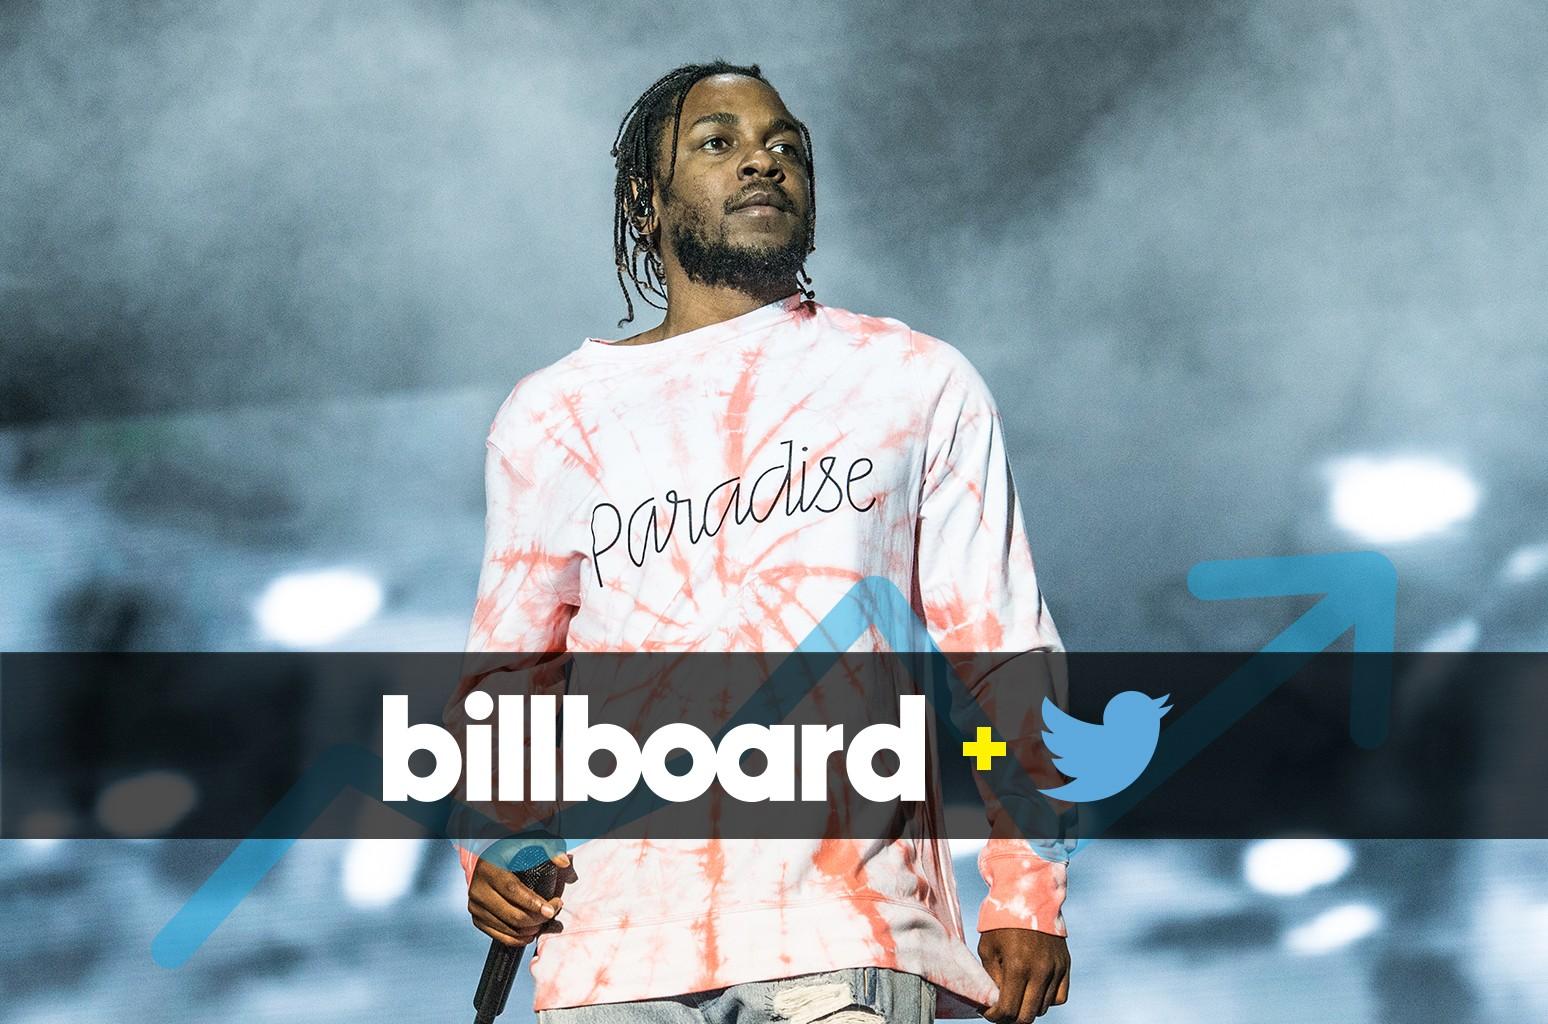 Kendrick Lamar performs at Austin City Limits Music Festival